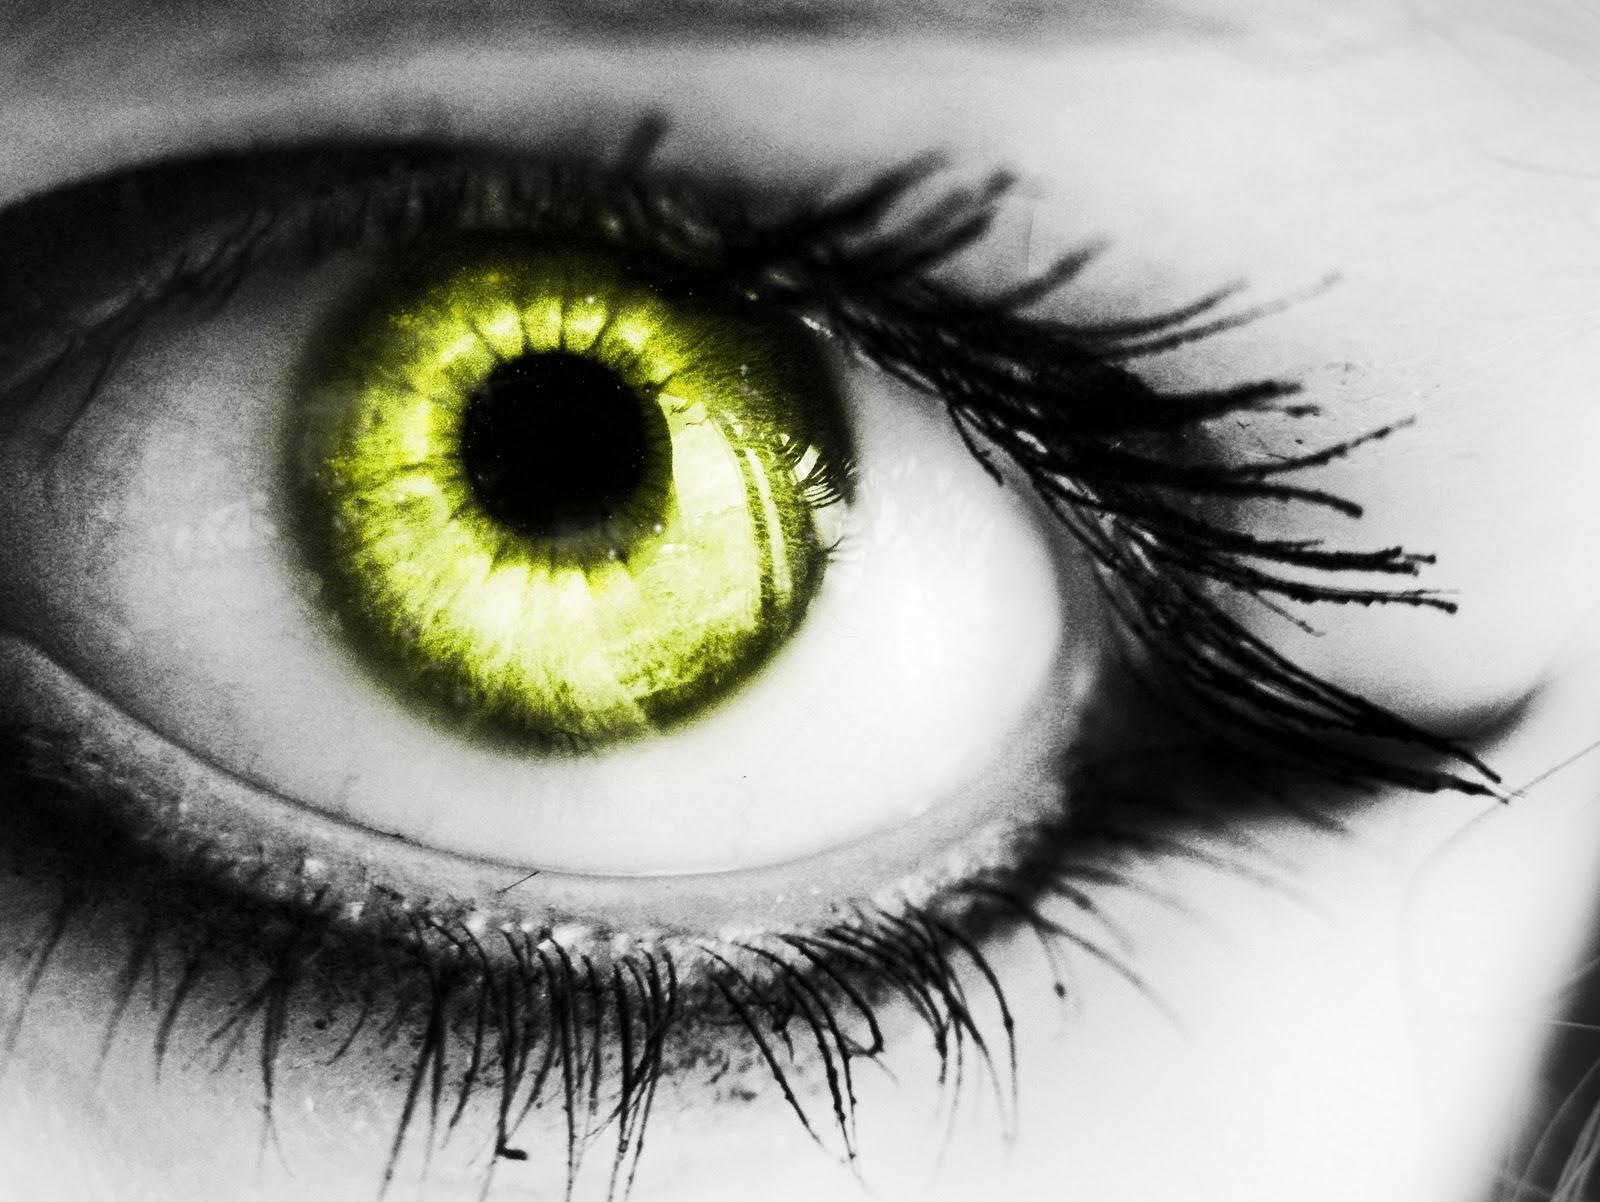 yellow eyes - photo #24